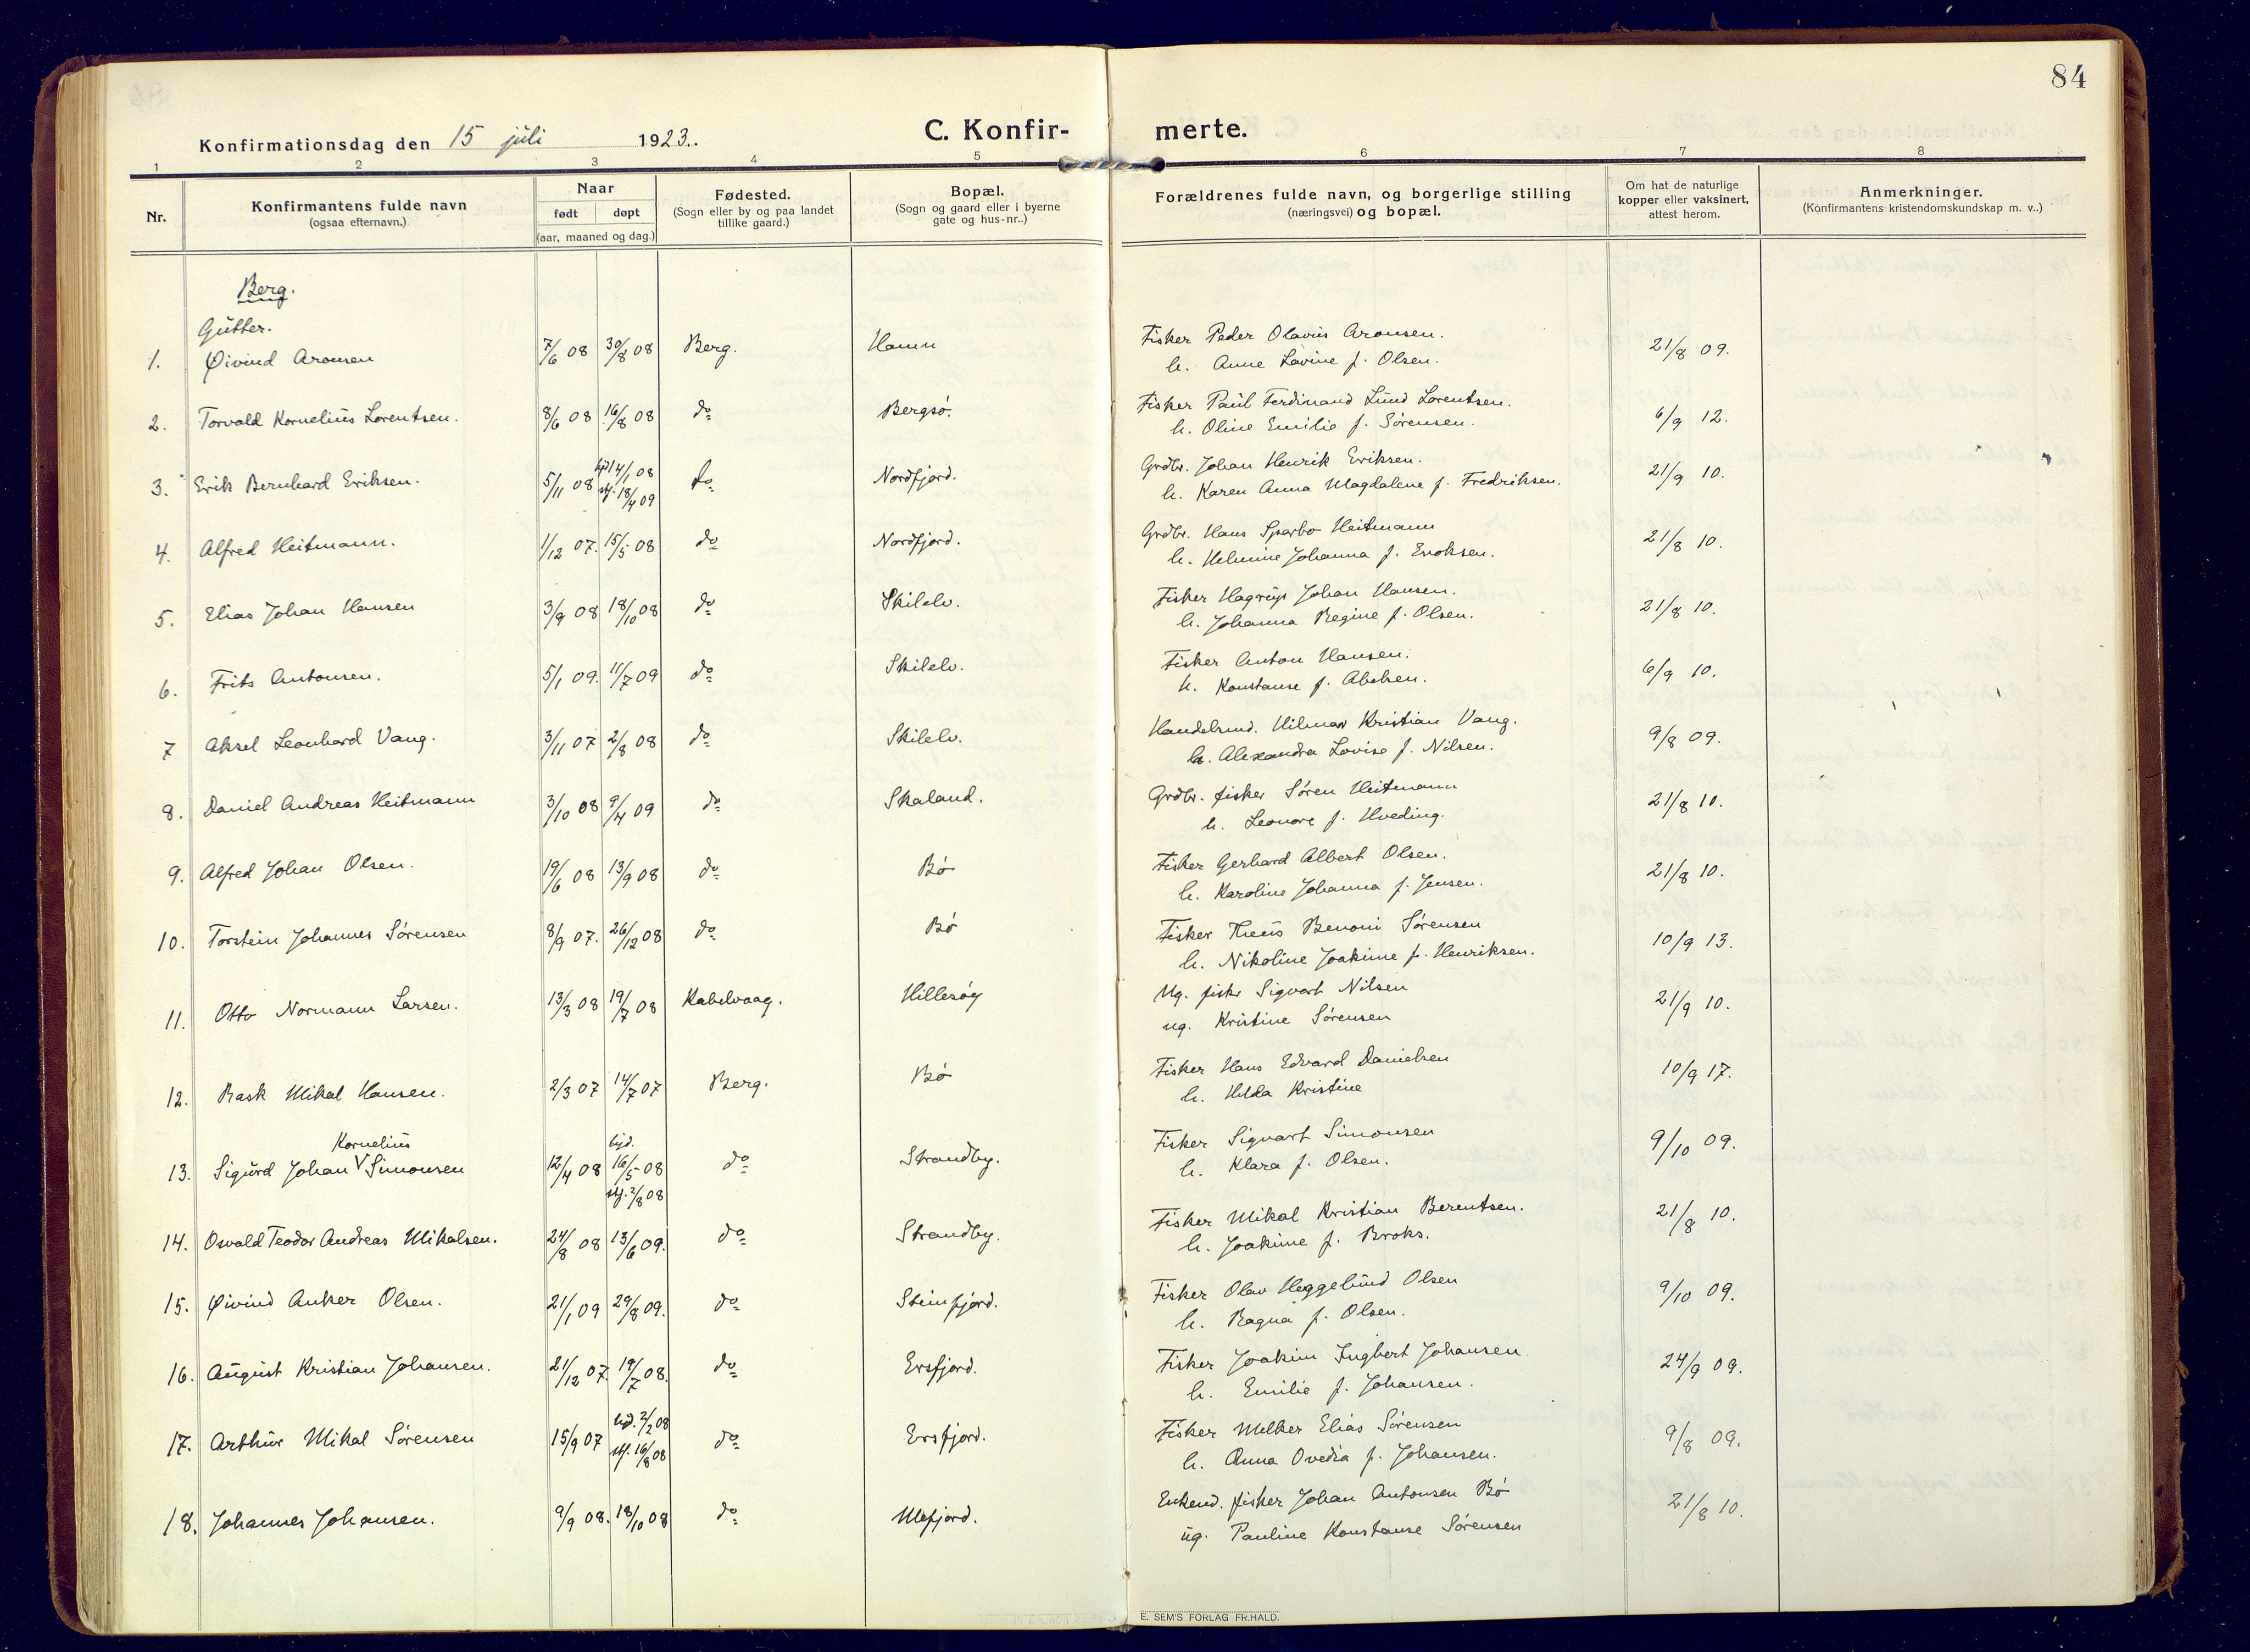 SATØ, Mefjord/Berg sokneprestkontor, G/Ga/Gaa: Ministerialbok nr. 9, 1916-1928, s. 84